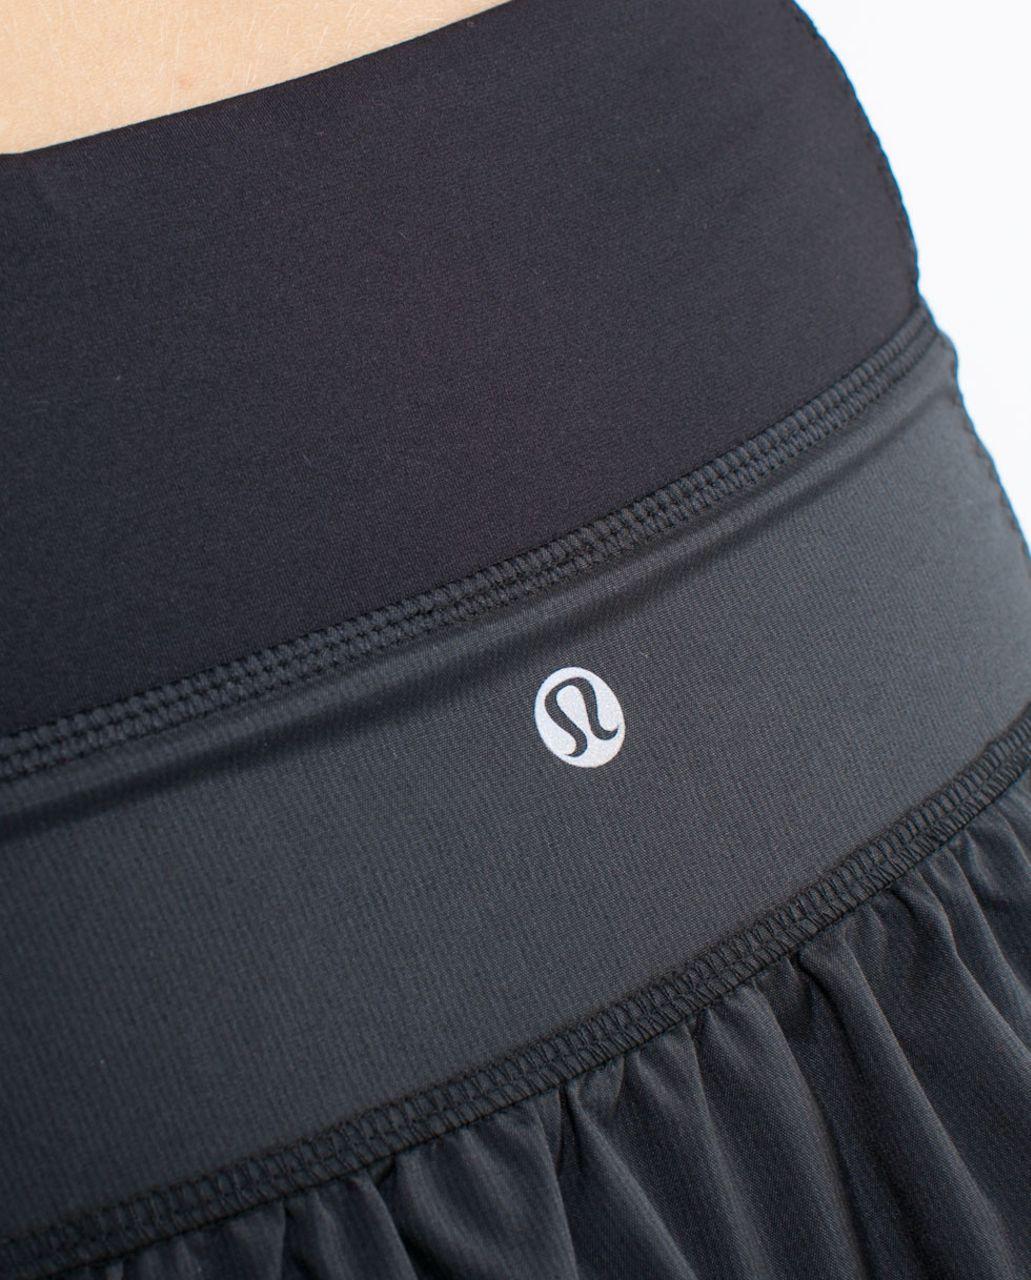 Lululemon Run:  Your Heart Out Skirt - Black Black Teeny Stripe /  Black /  Black Echo Stripe